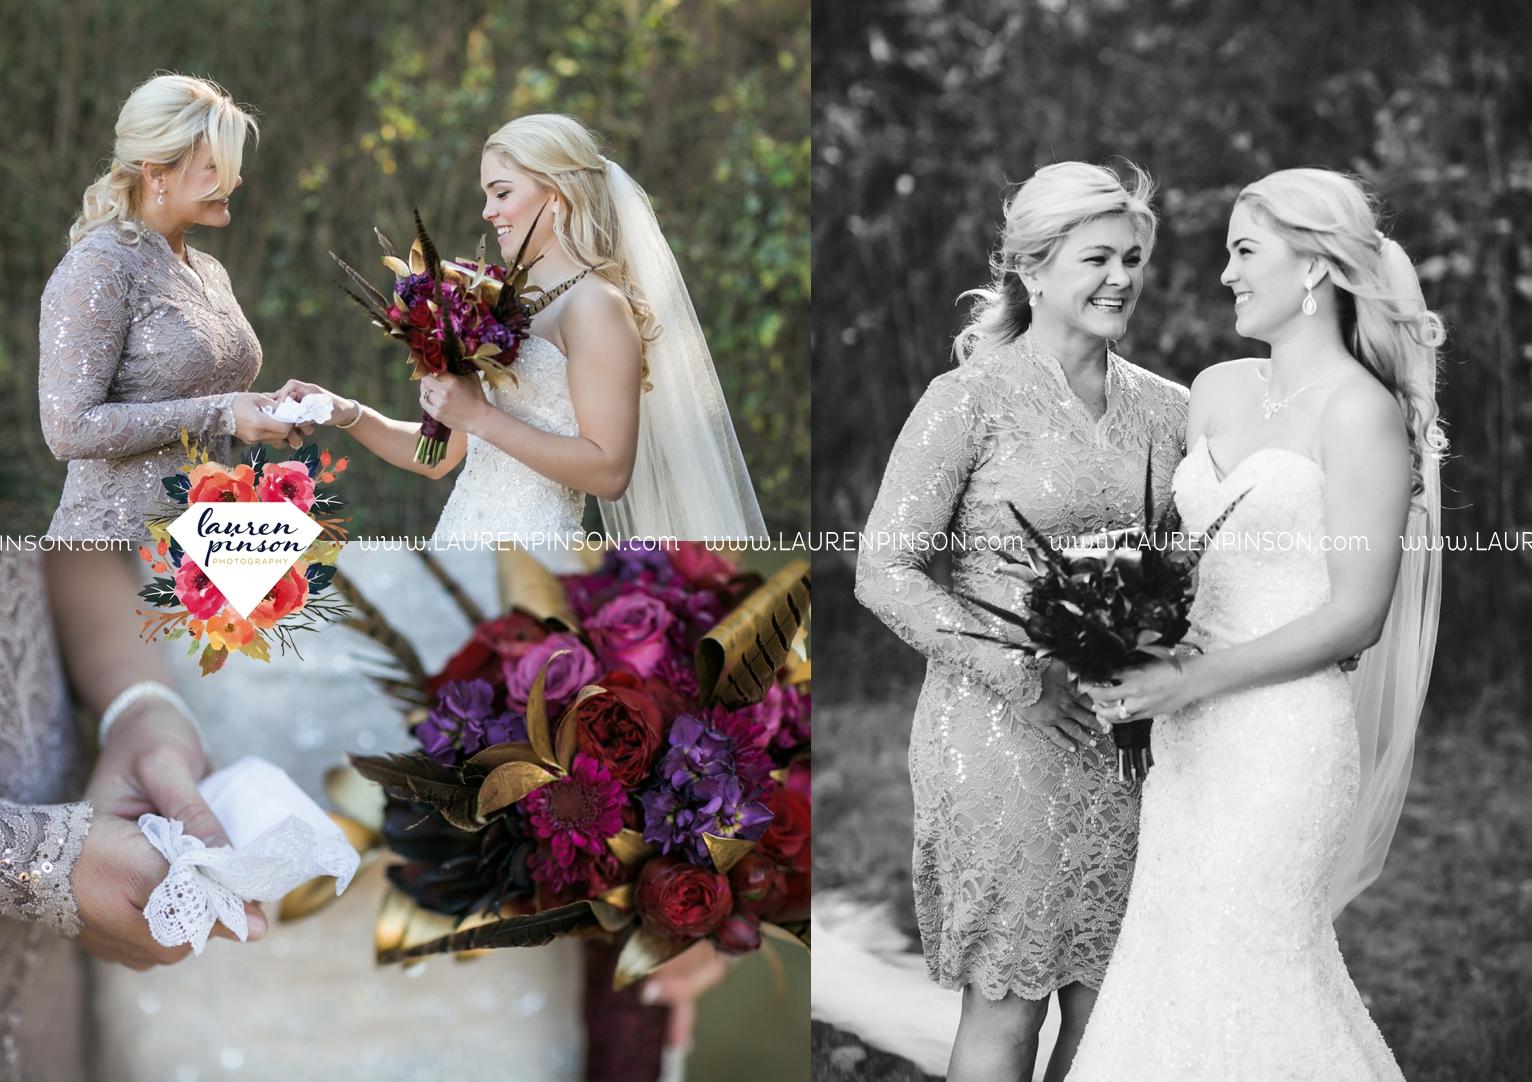 rustic-wichita-falls-texas-wedding-photographer-gold-glam-mayfield-events-market-street-united-allue-bridals-fall_1719.jpg